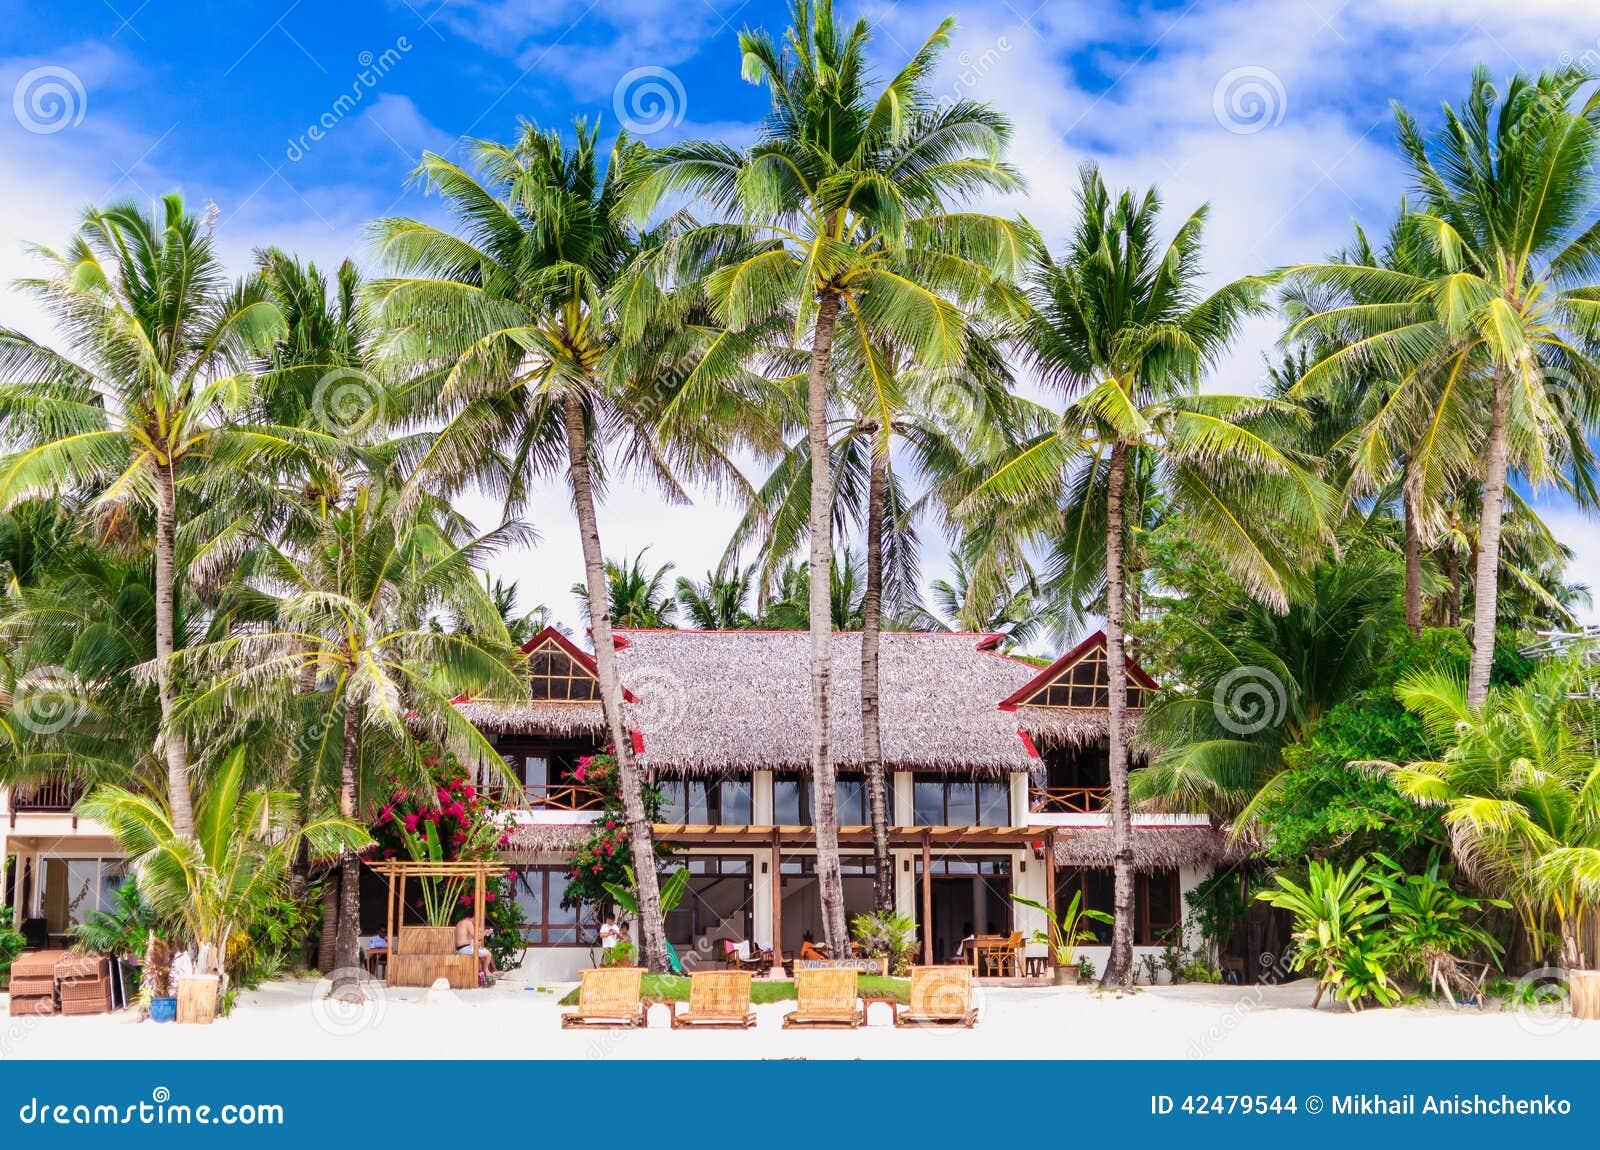 Luxury villa and palm trees at beautiful white sandy beach